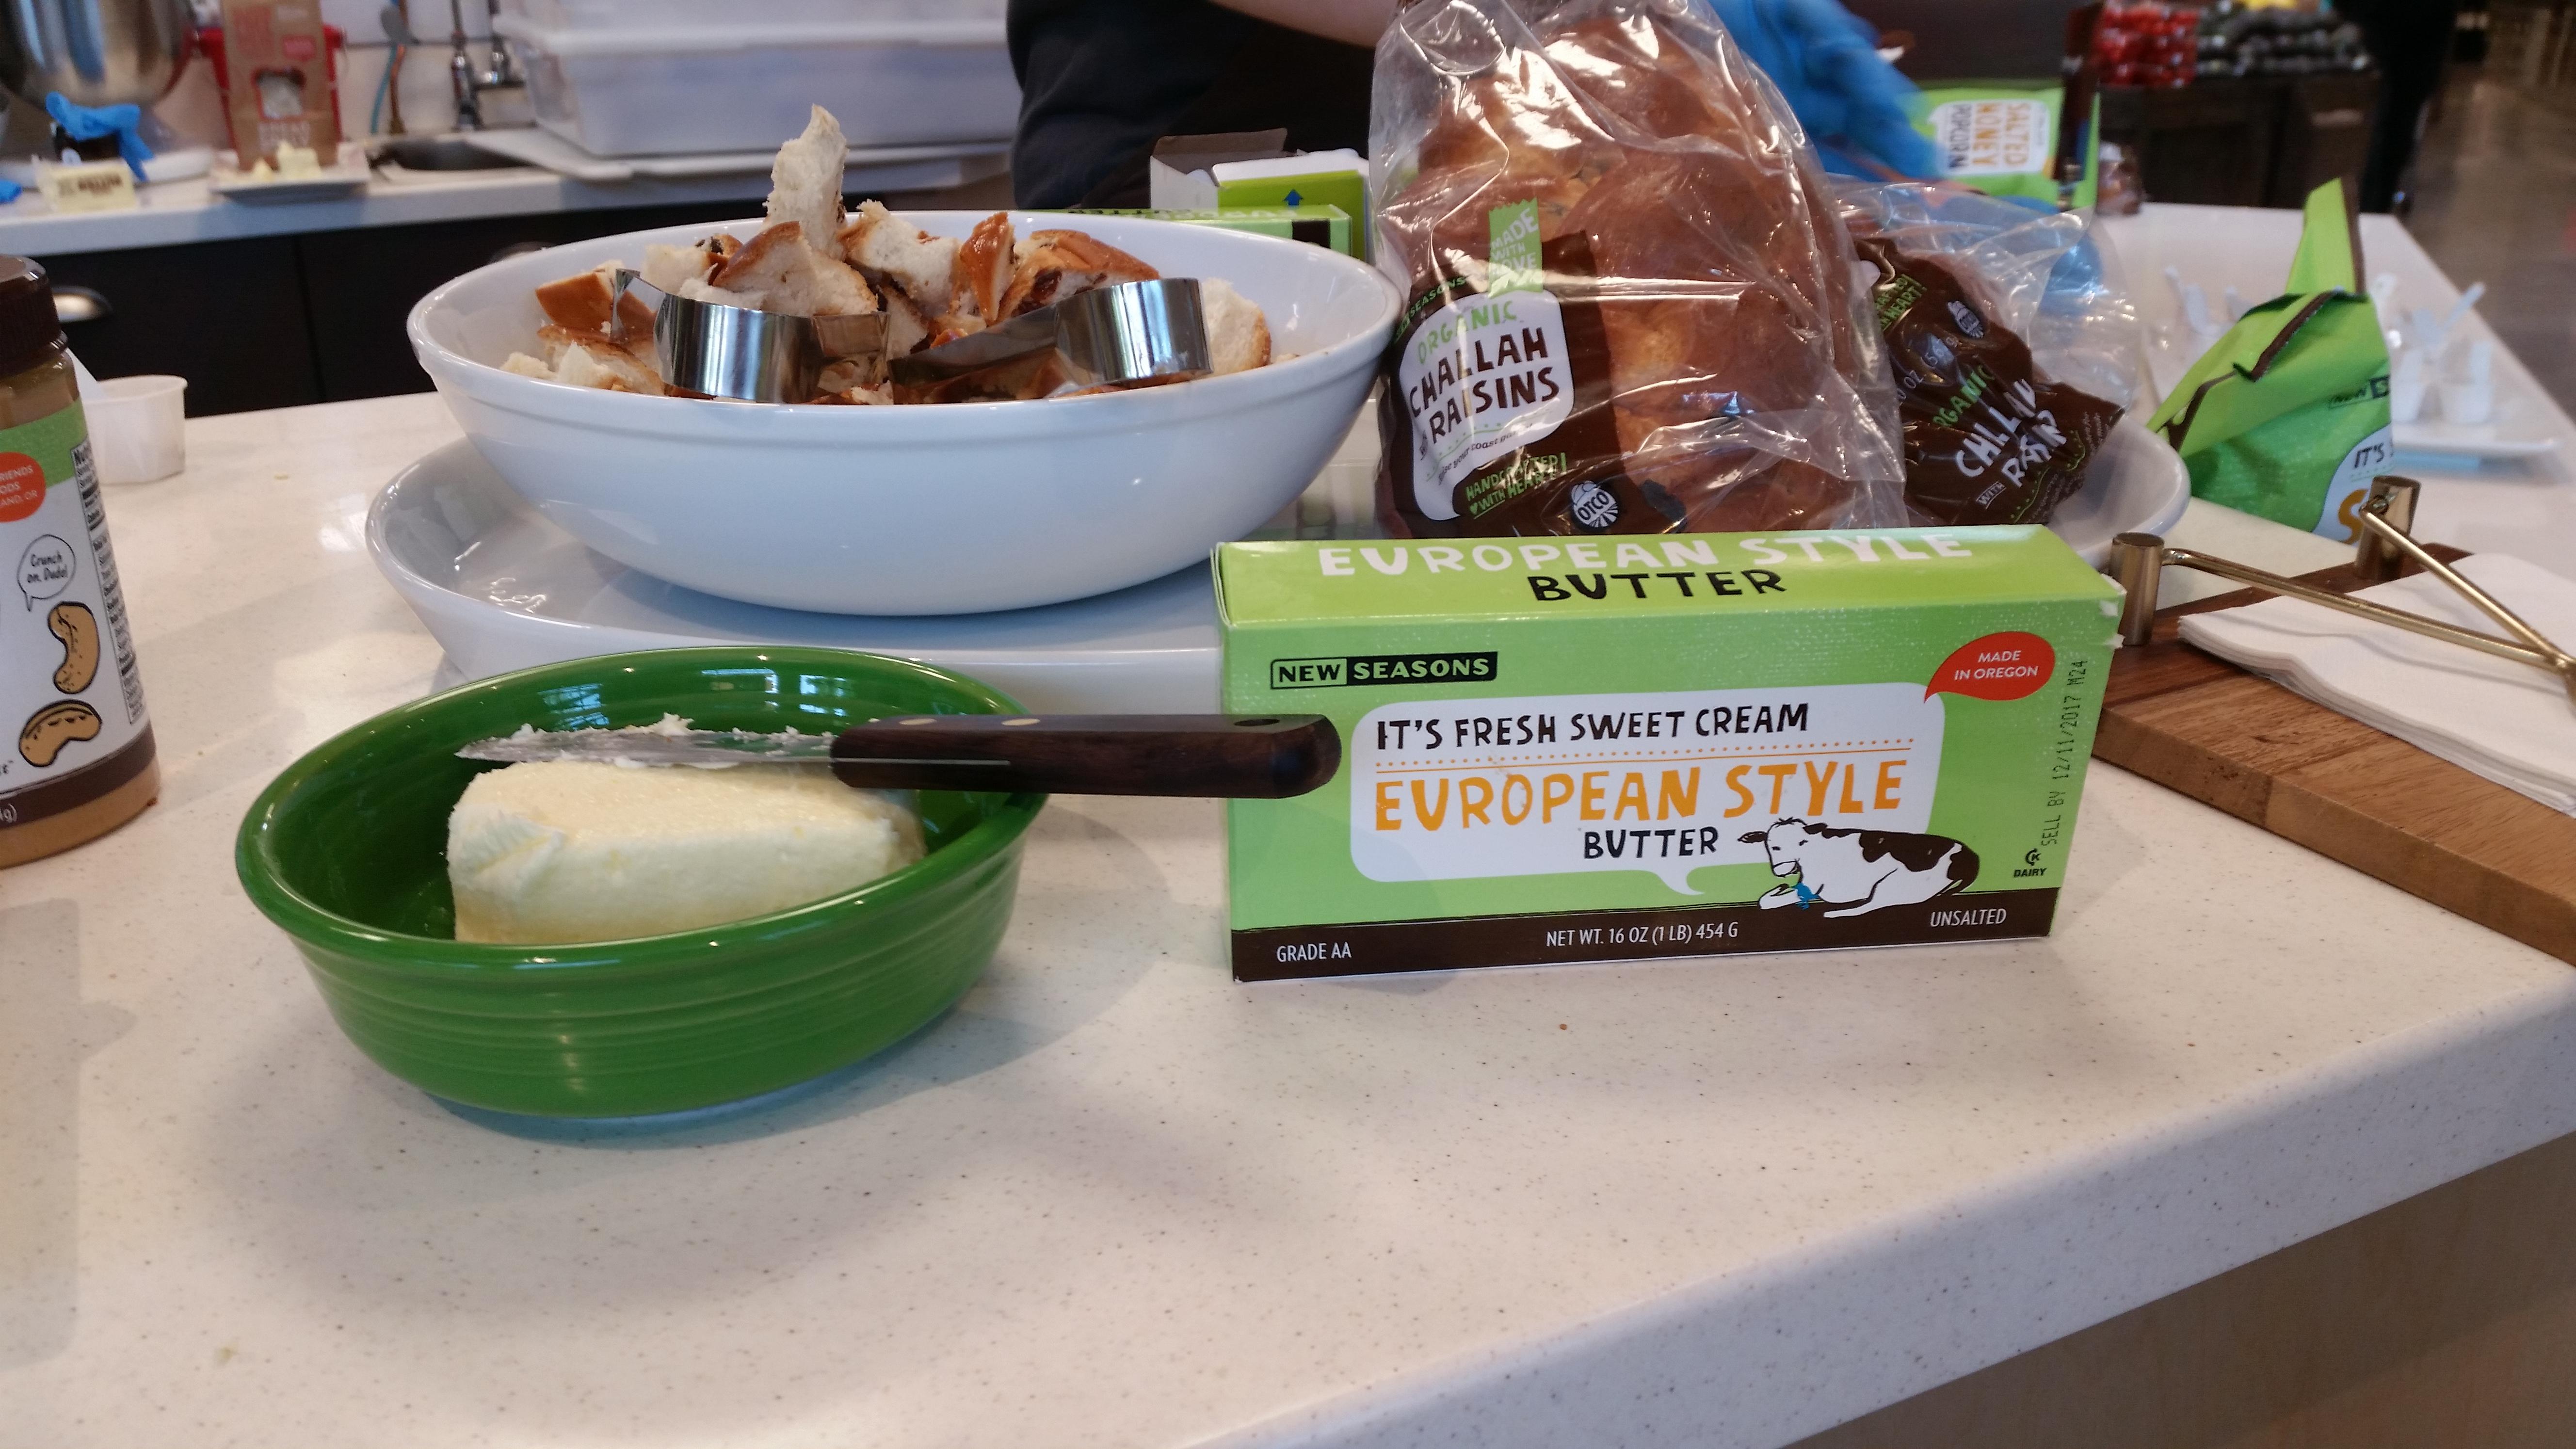 European Style Butter New Season Market Brand